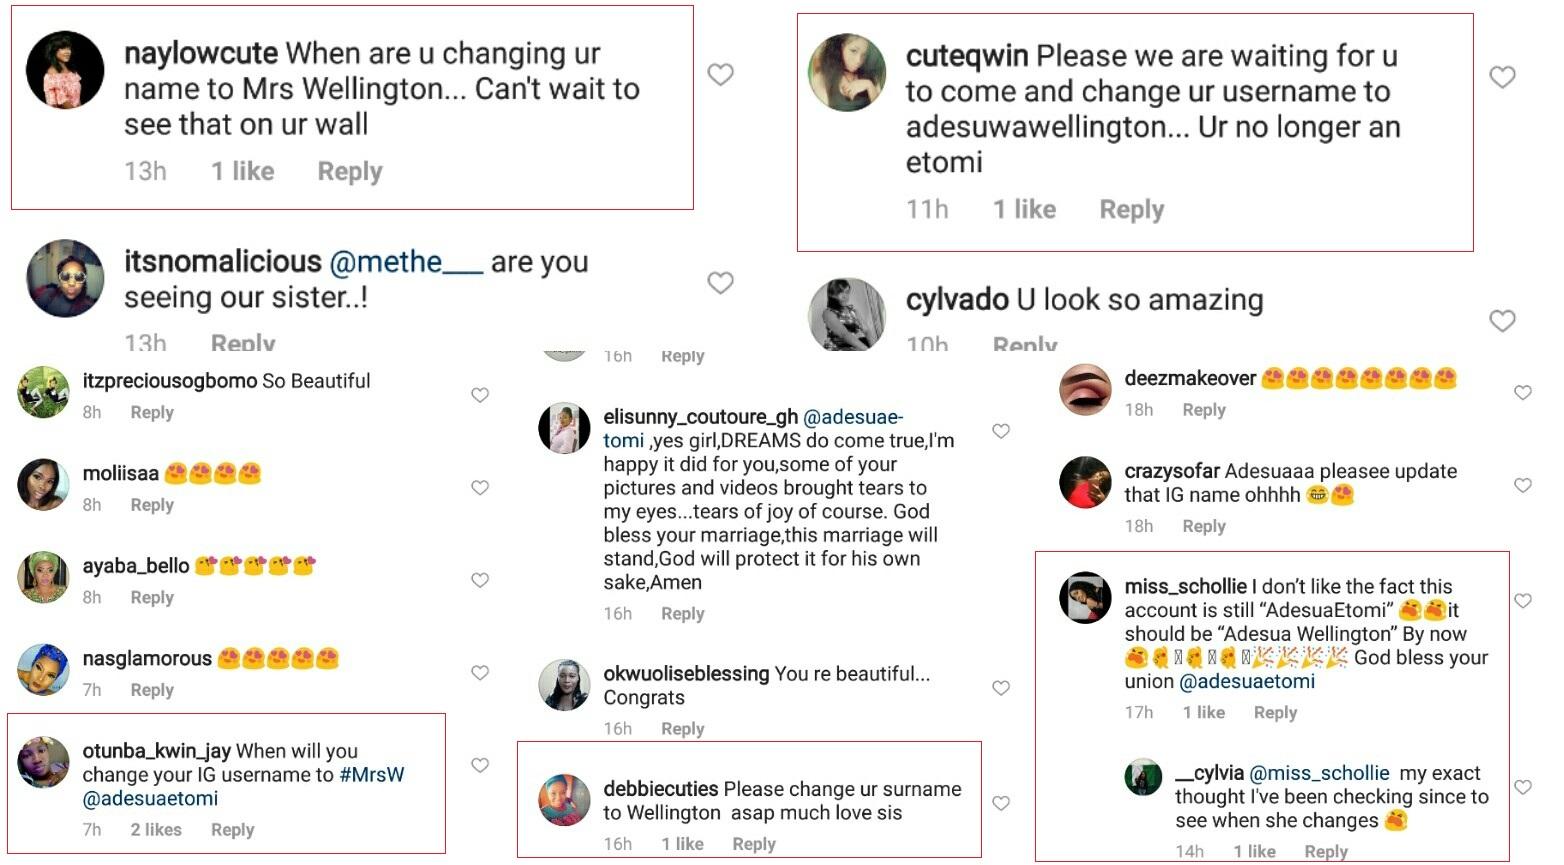 Some aprokos are already asking Adesua Etomi why she hasn